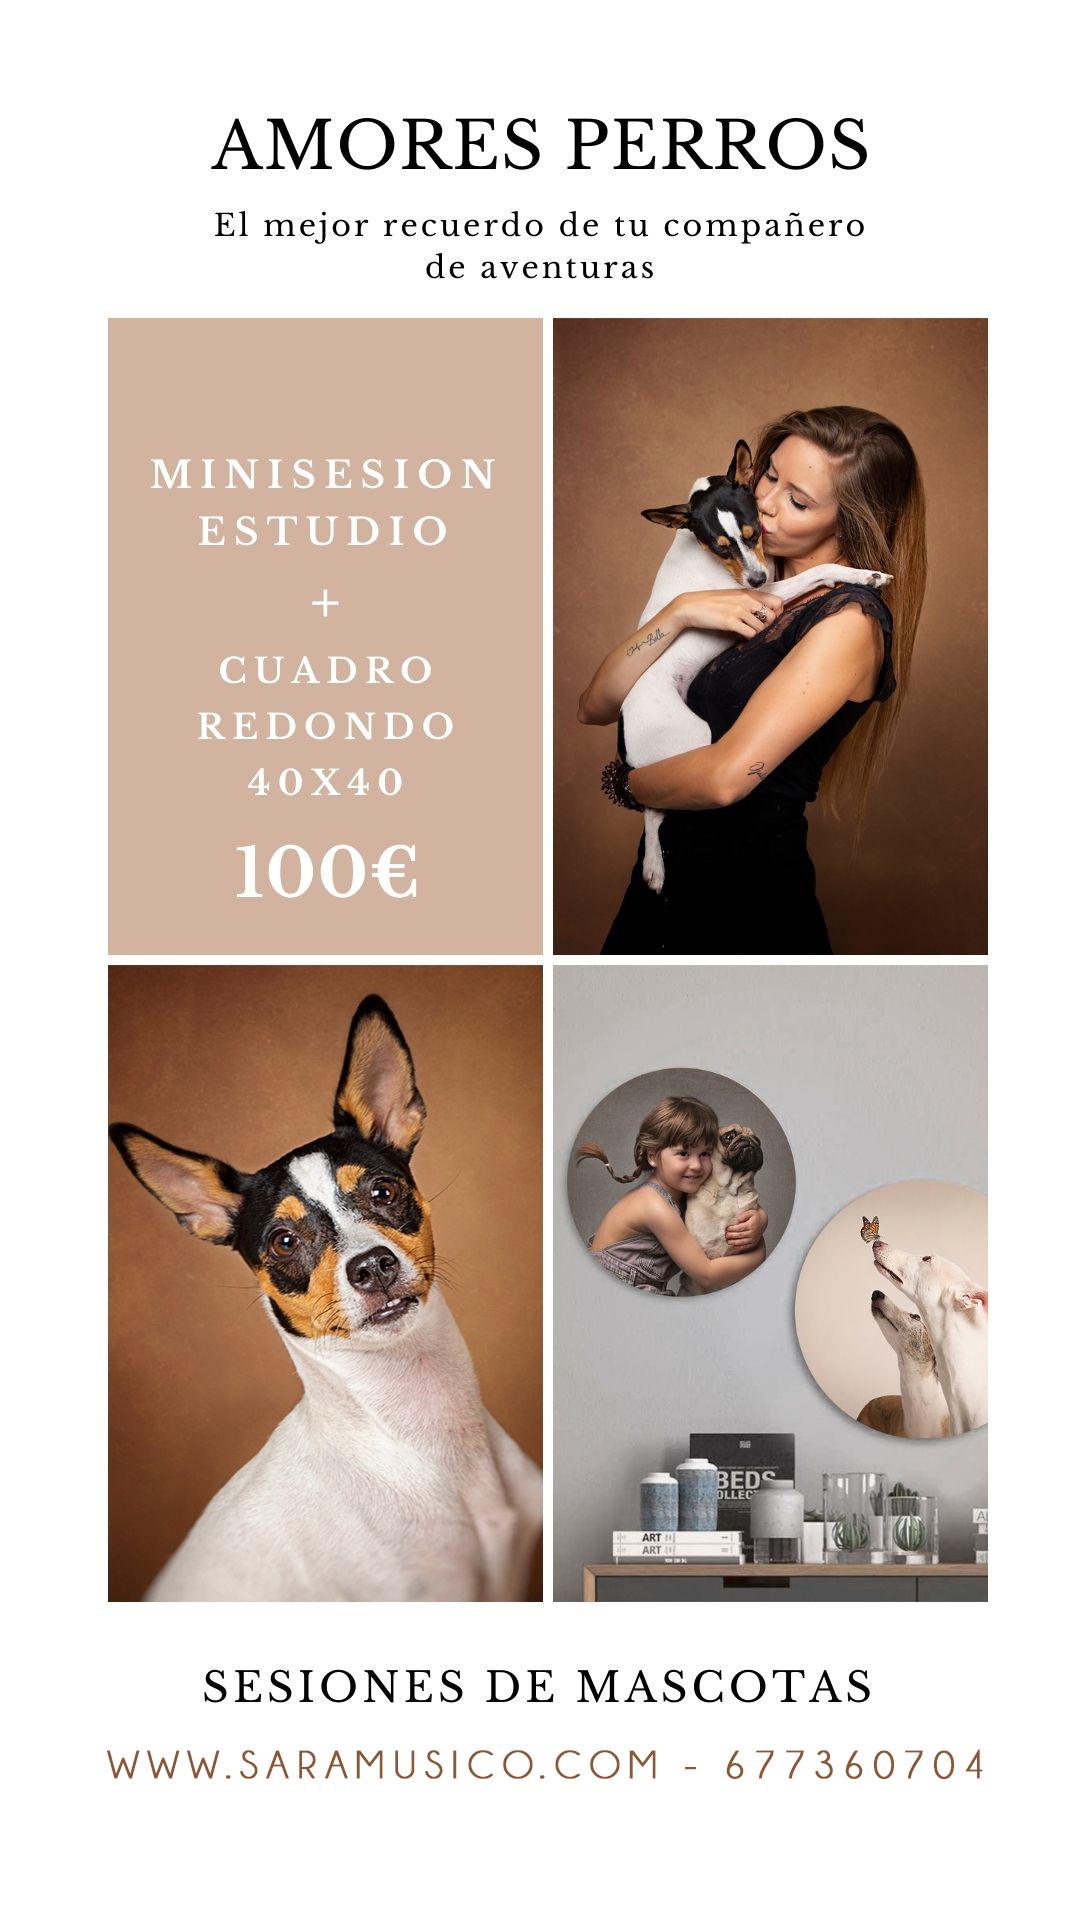 Promocion Book de mascotas